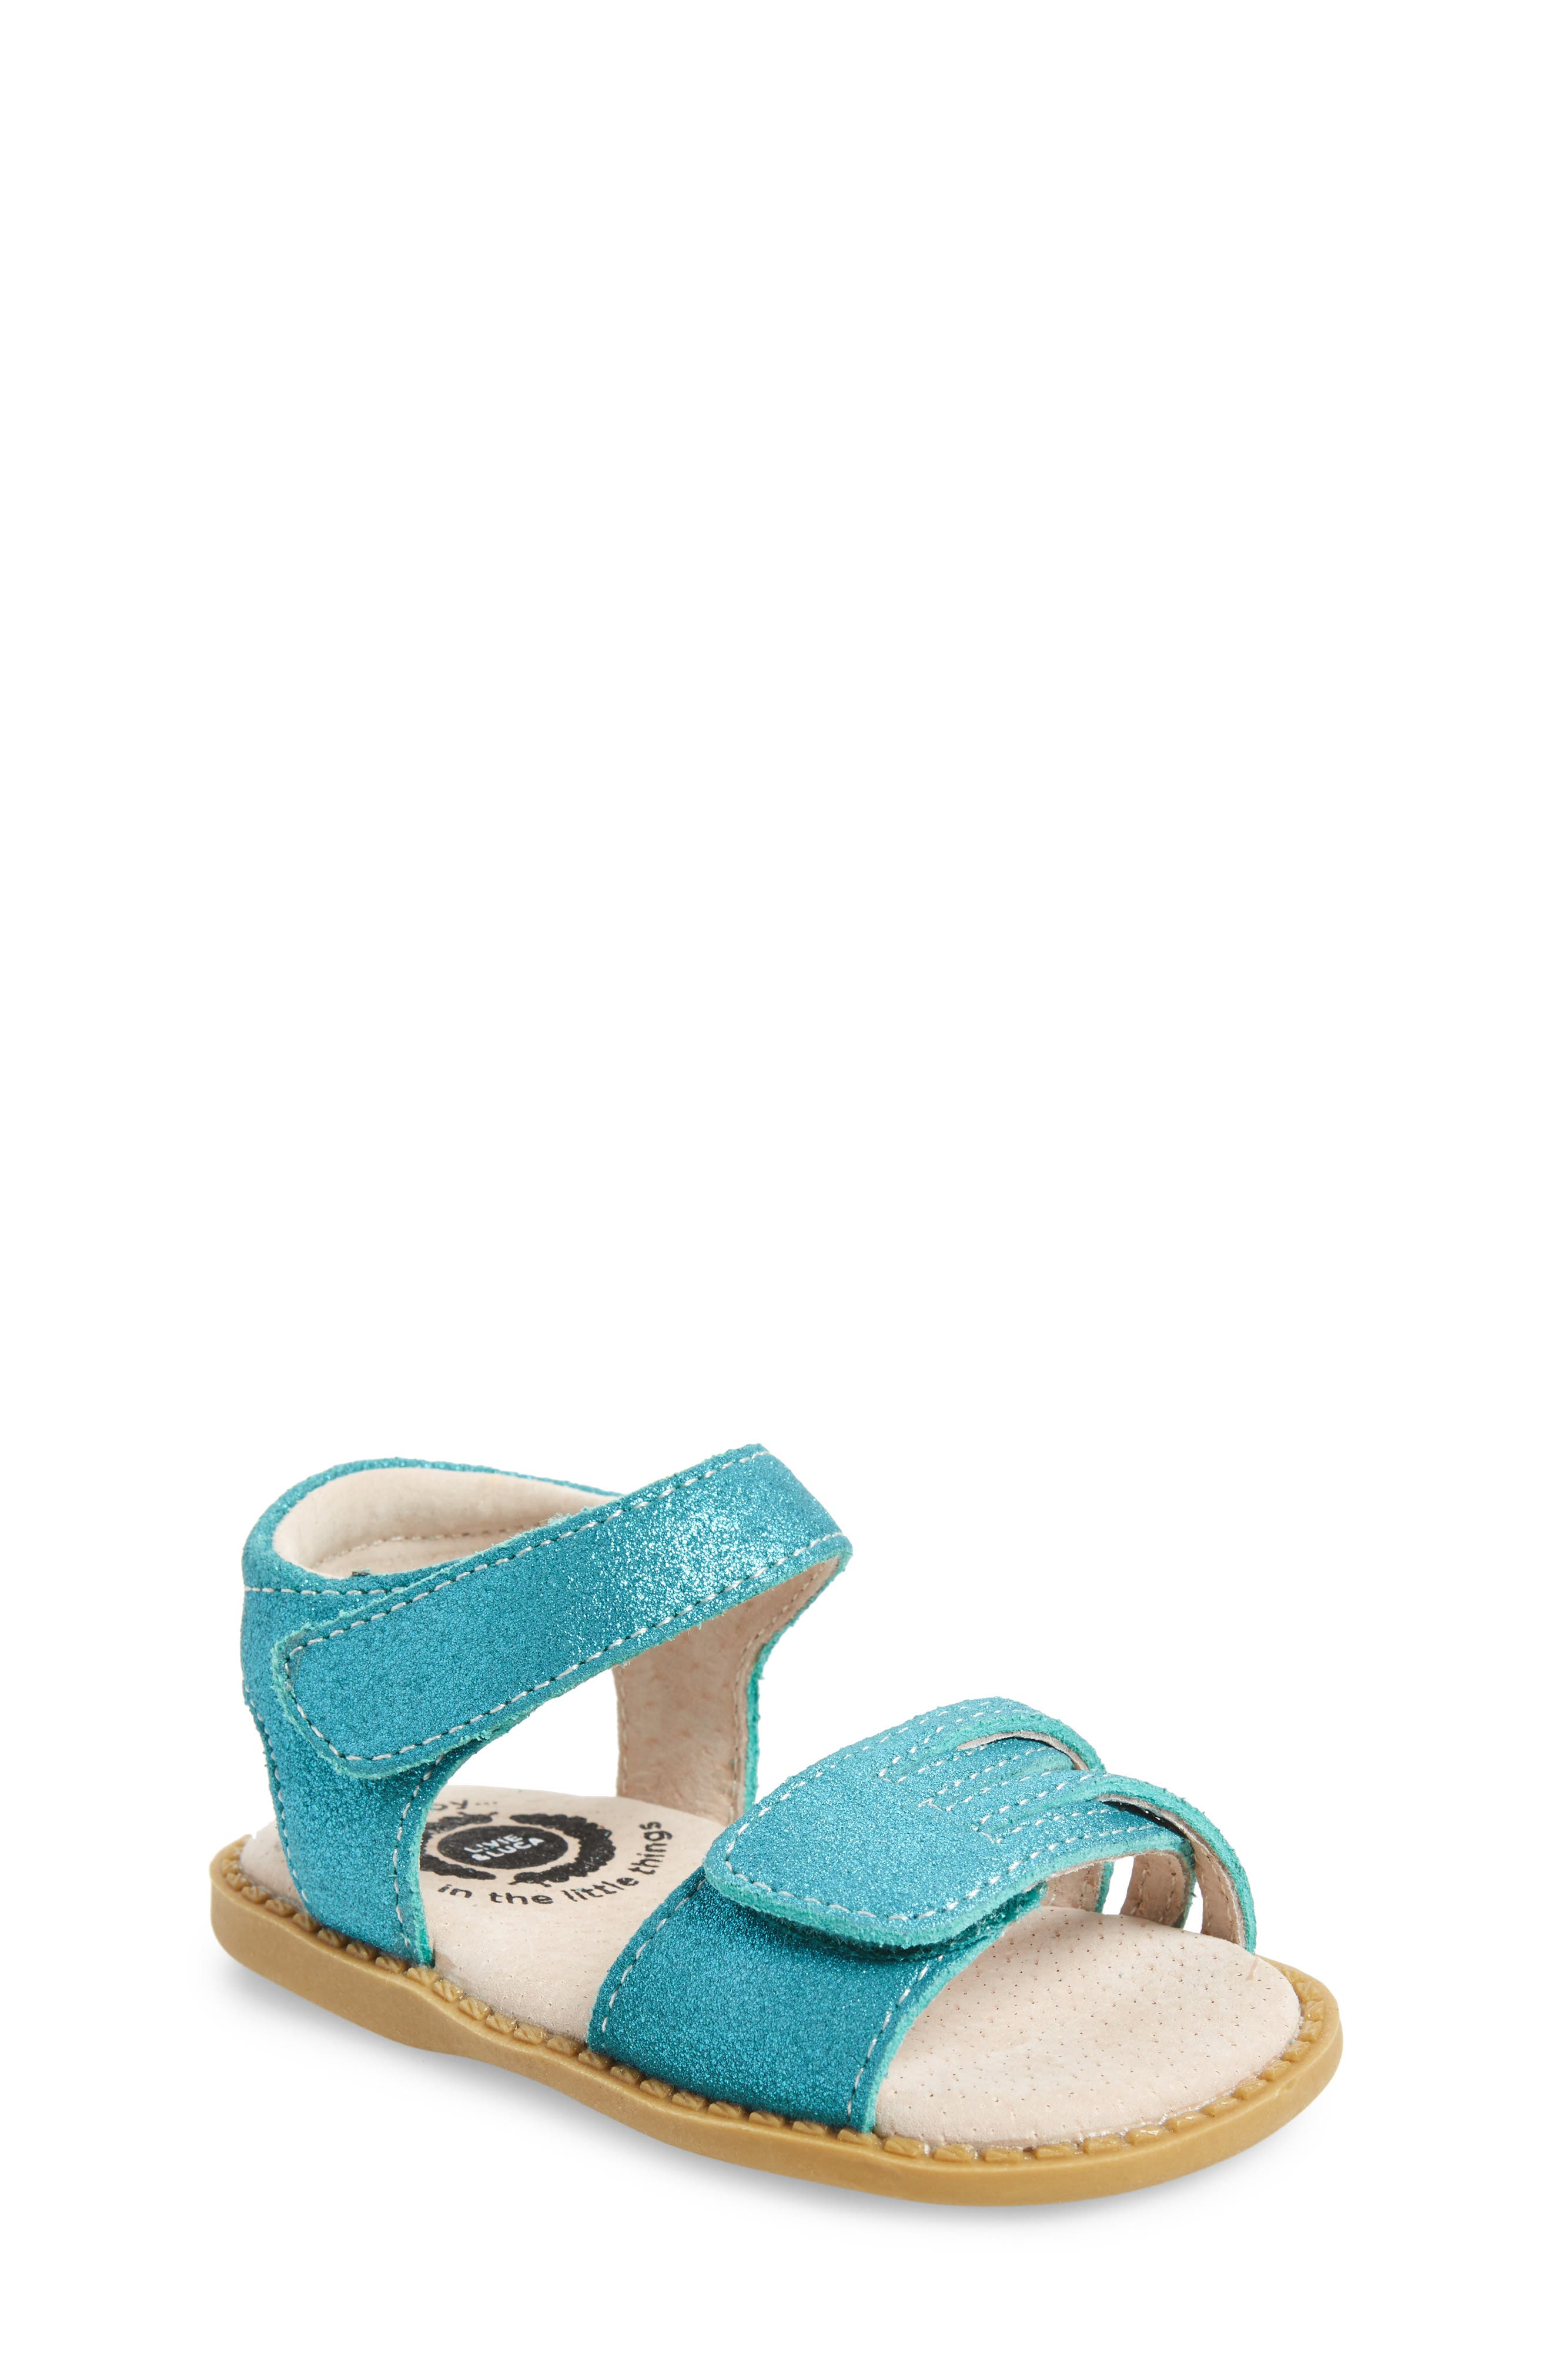 'Athena' Sandal,                             Main thumbnail 1, color,                             Aqua Shimmer